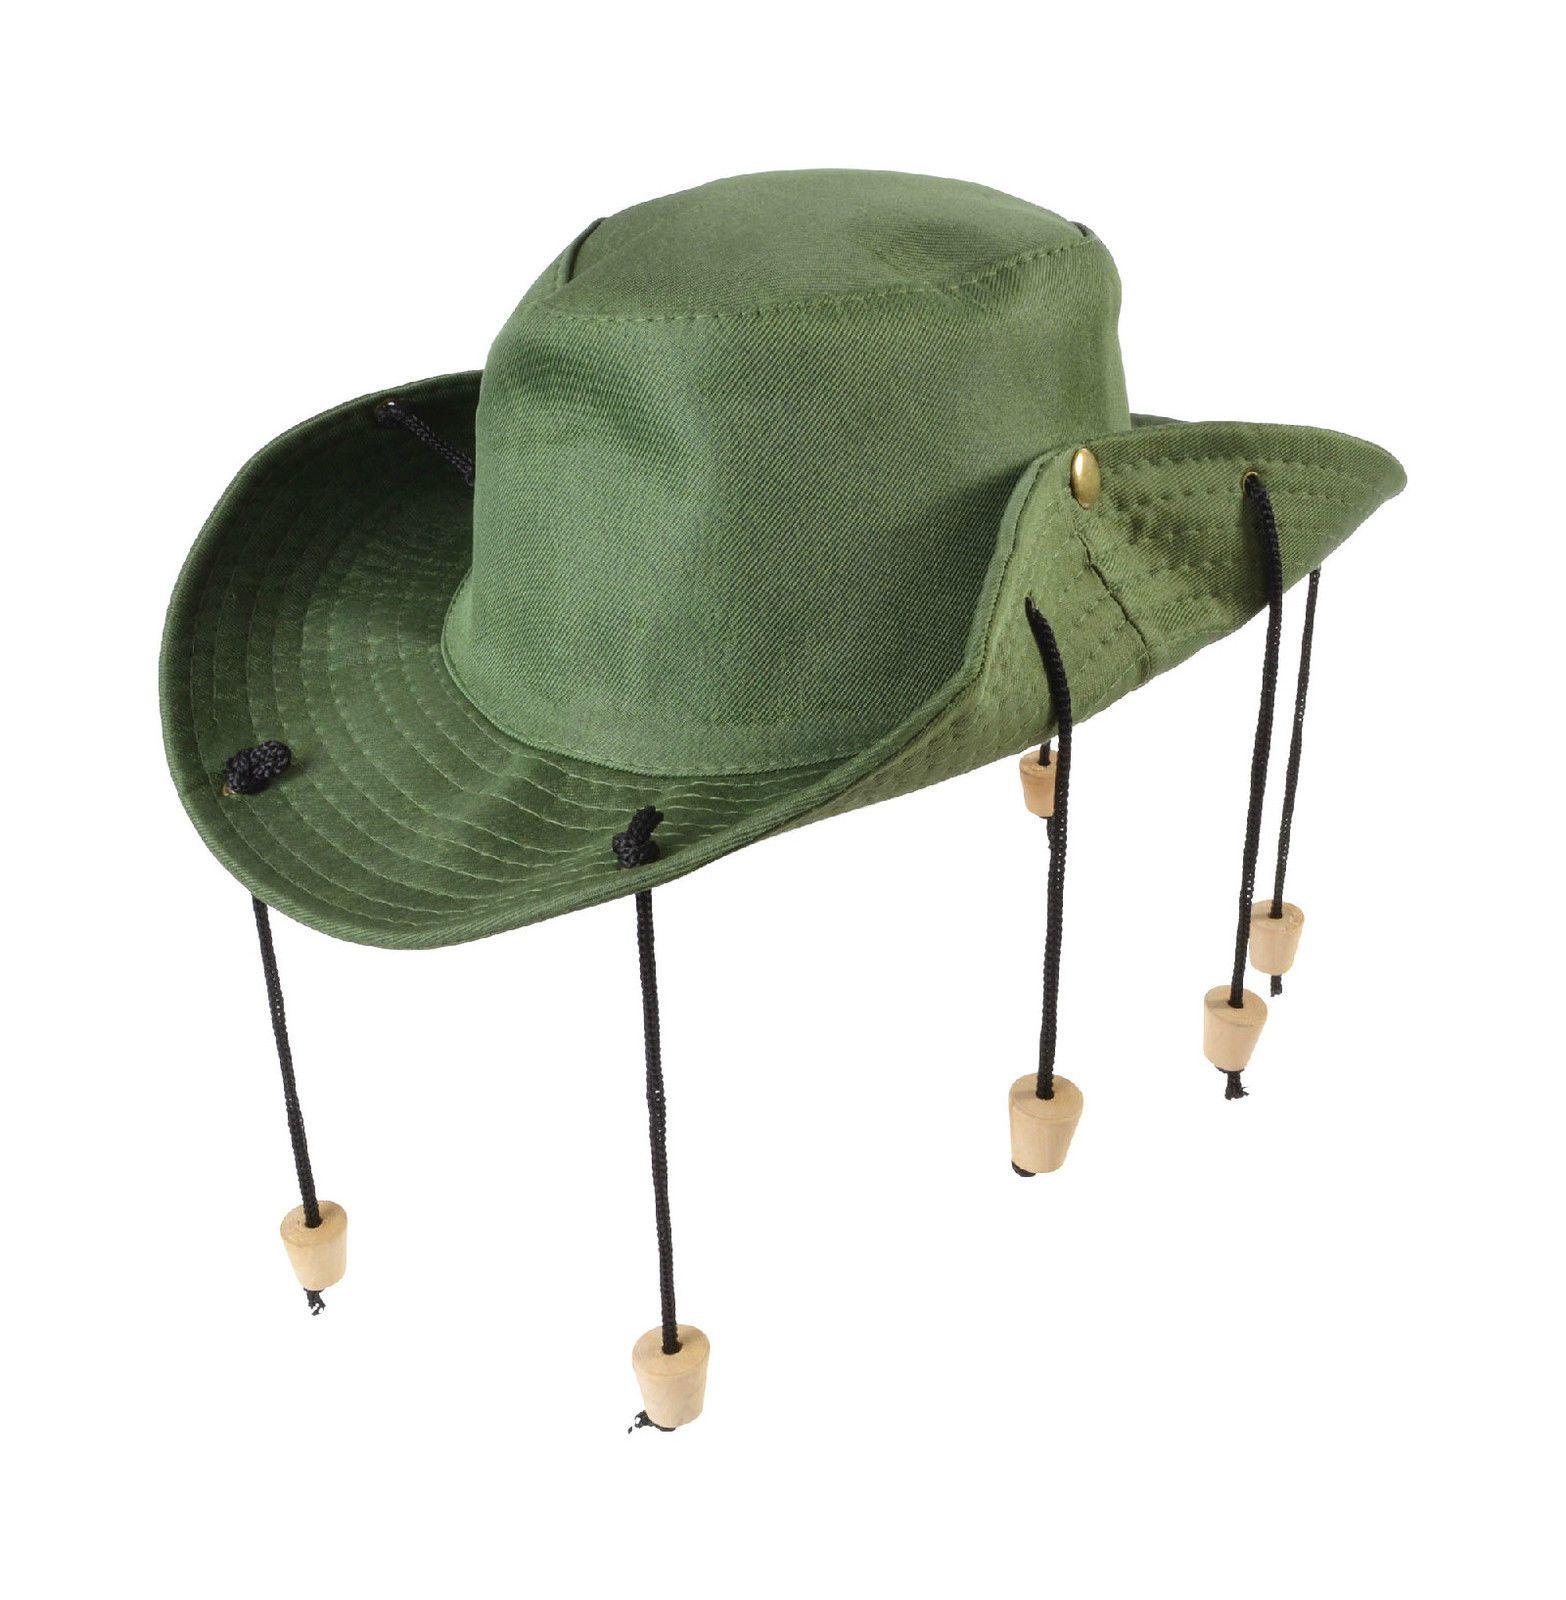 384ed312a4c Adult aussie australian outback hat with corks fancy dress one size  accessory jpg 1566x1600 Aussie cork